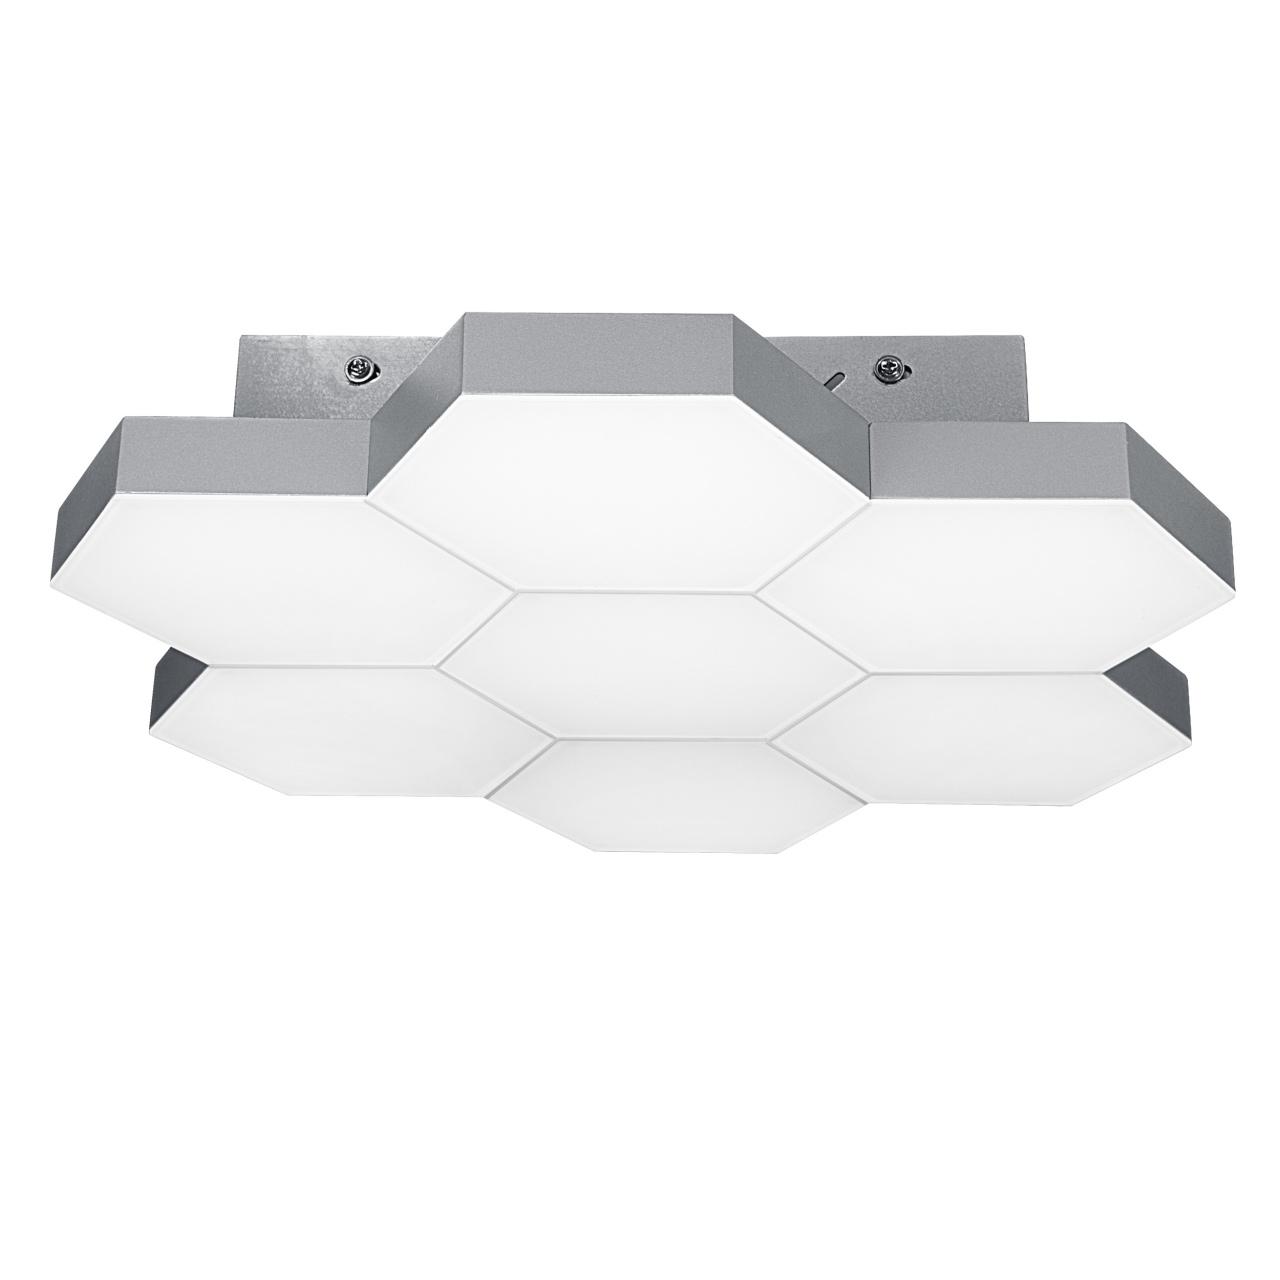 Люстра потолочная Favo LED-35W 1680LM silver 4000K Lightstar 750074